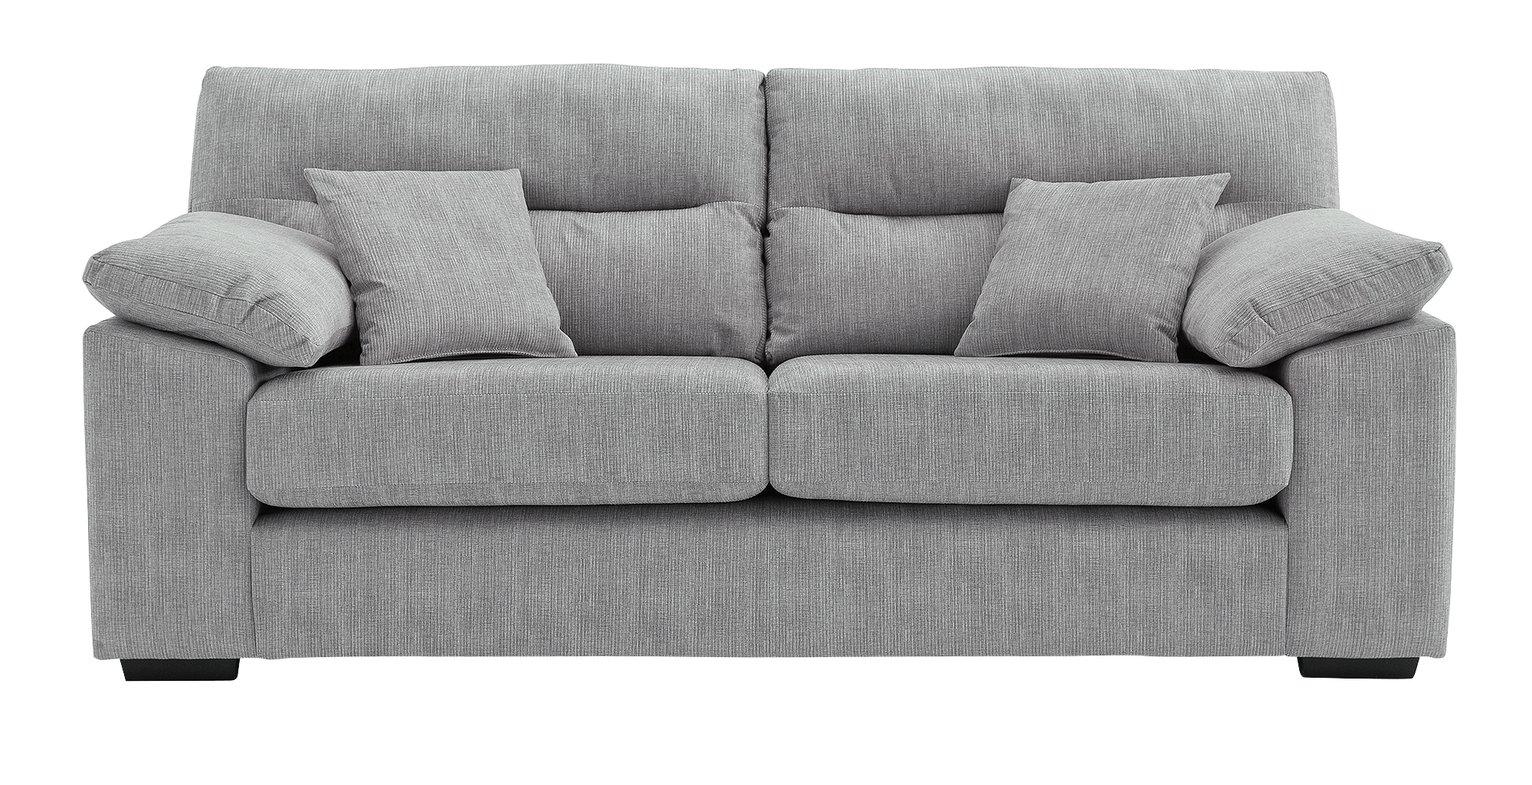 Argos Home Donavan 3 Seater Fabric Sofa - Silver